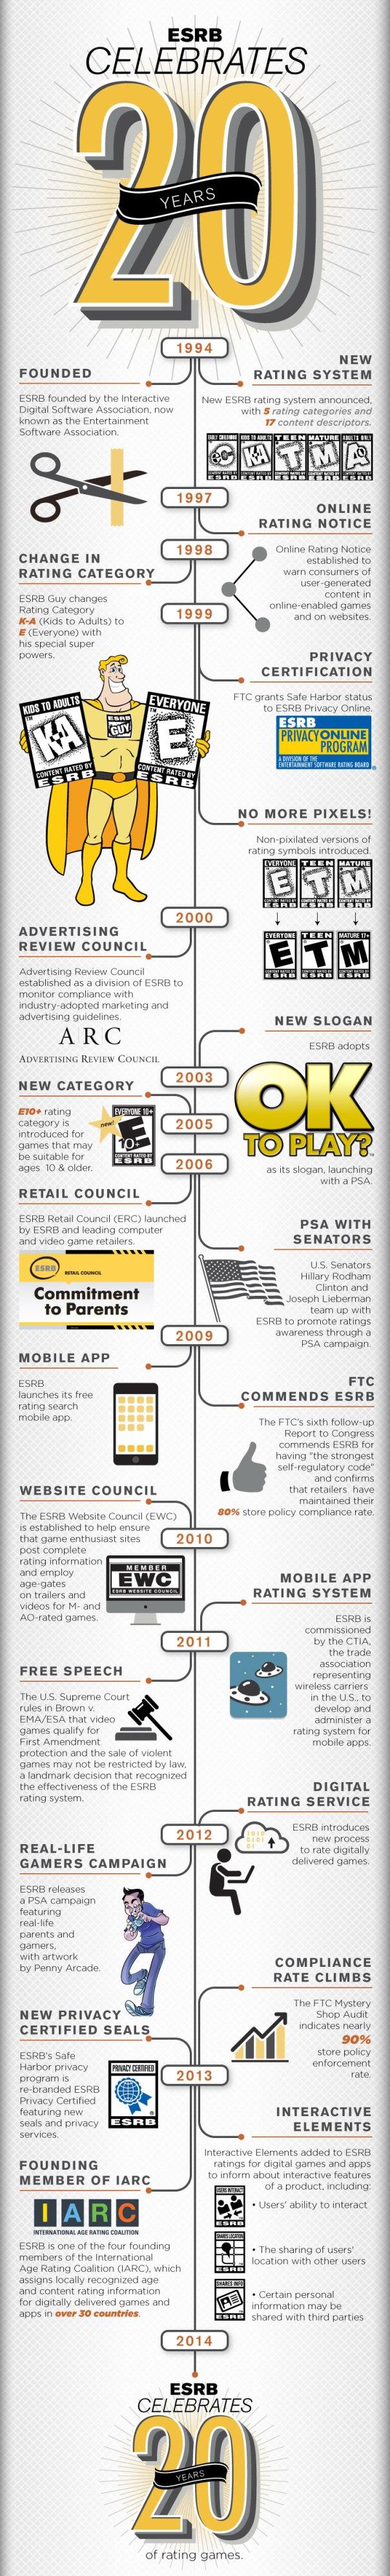 esrb-20-years-infographic